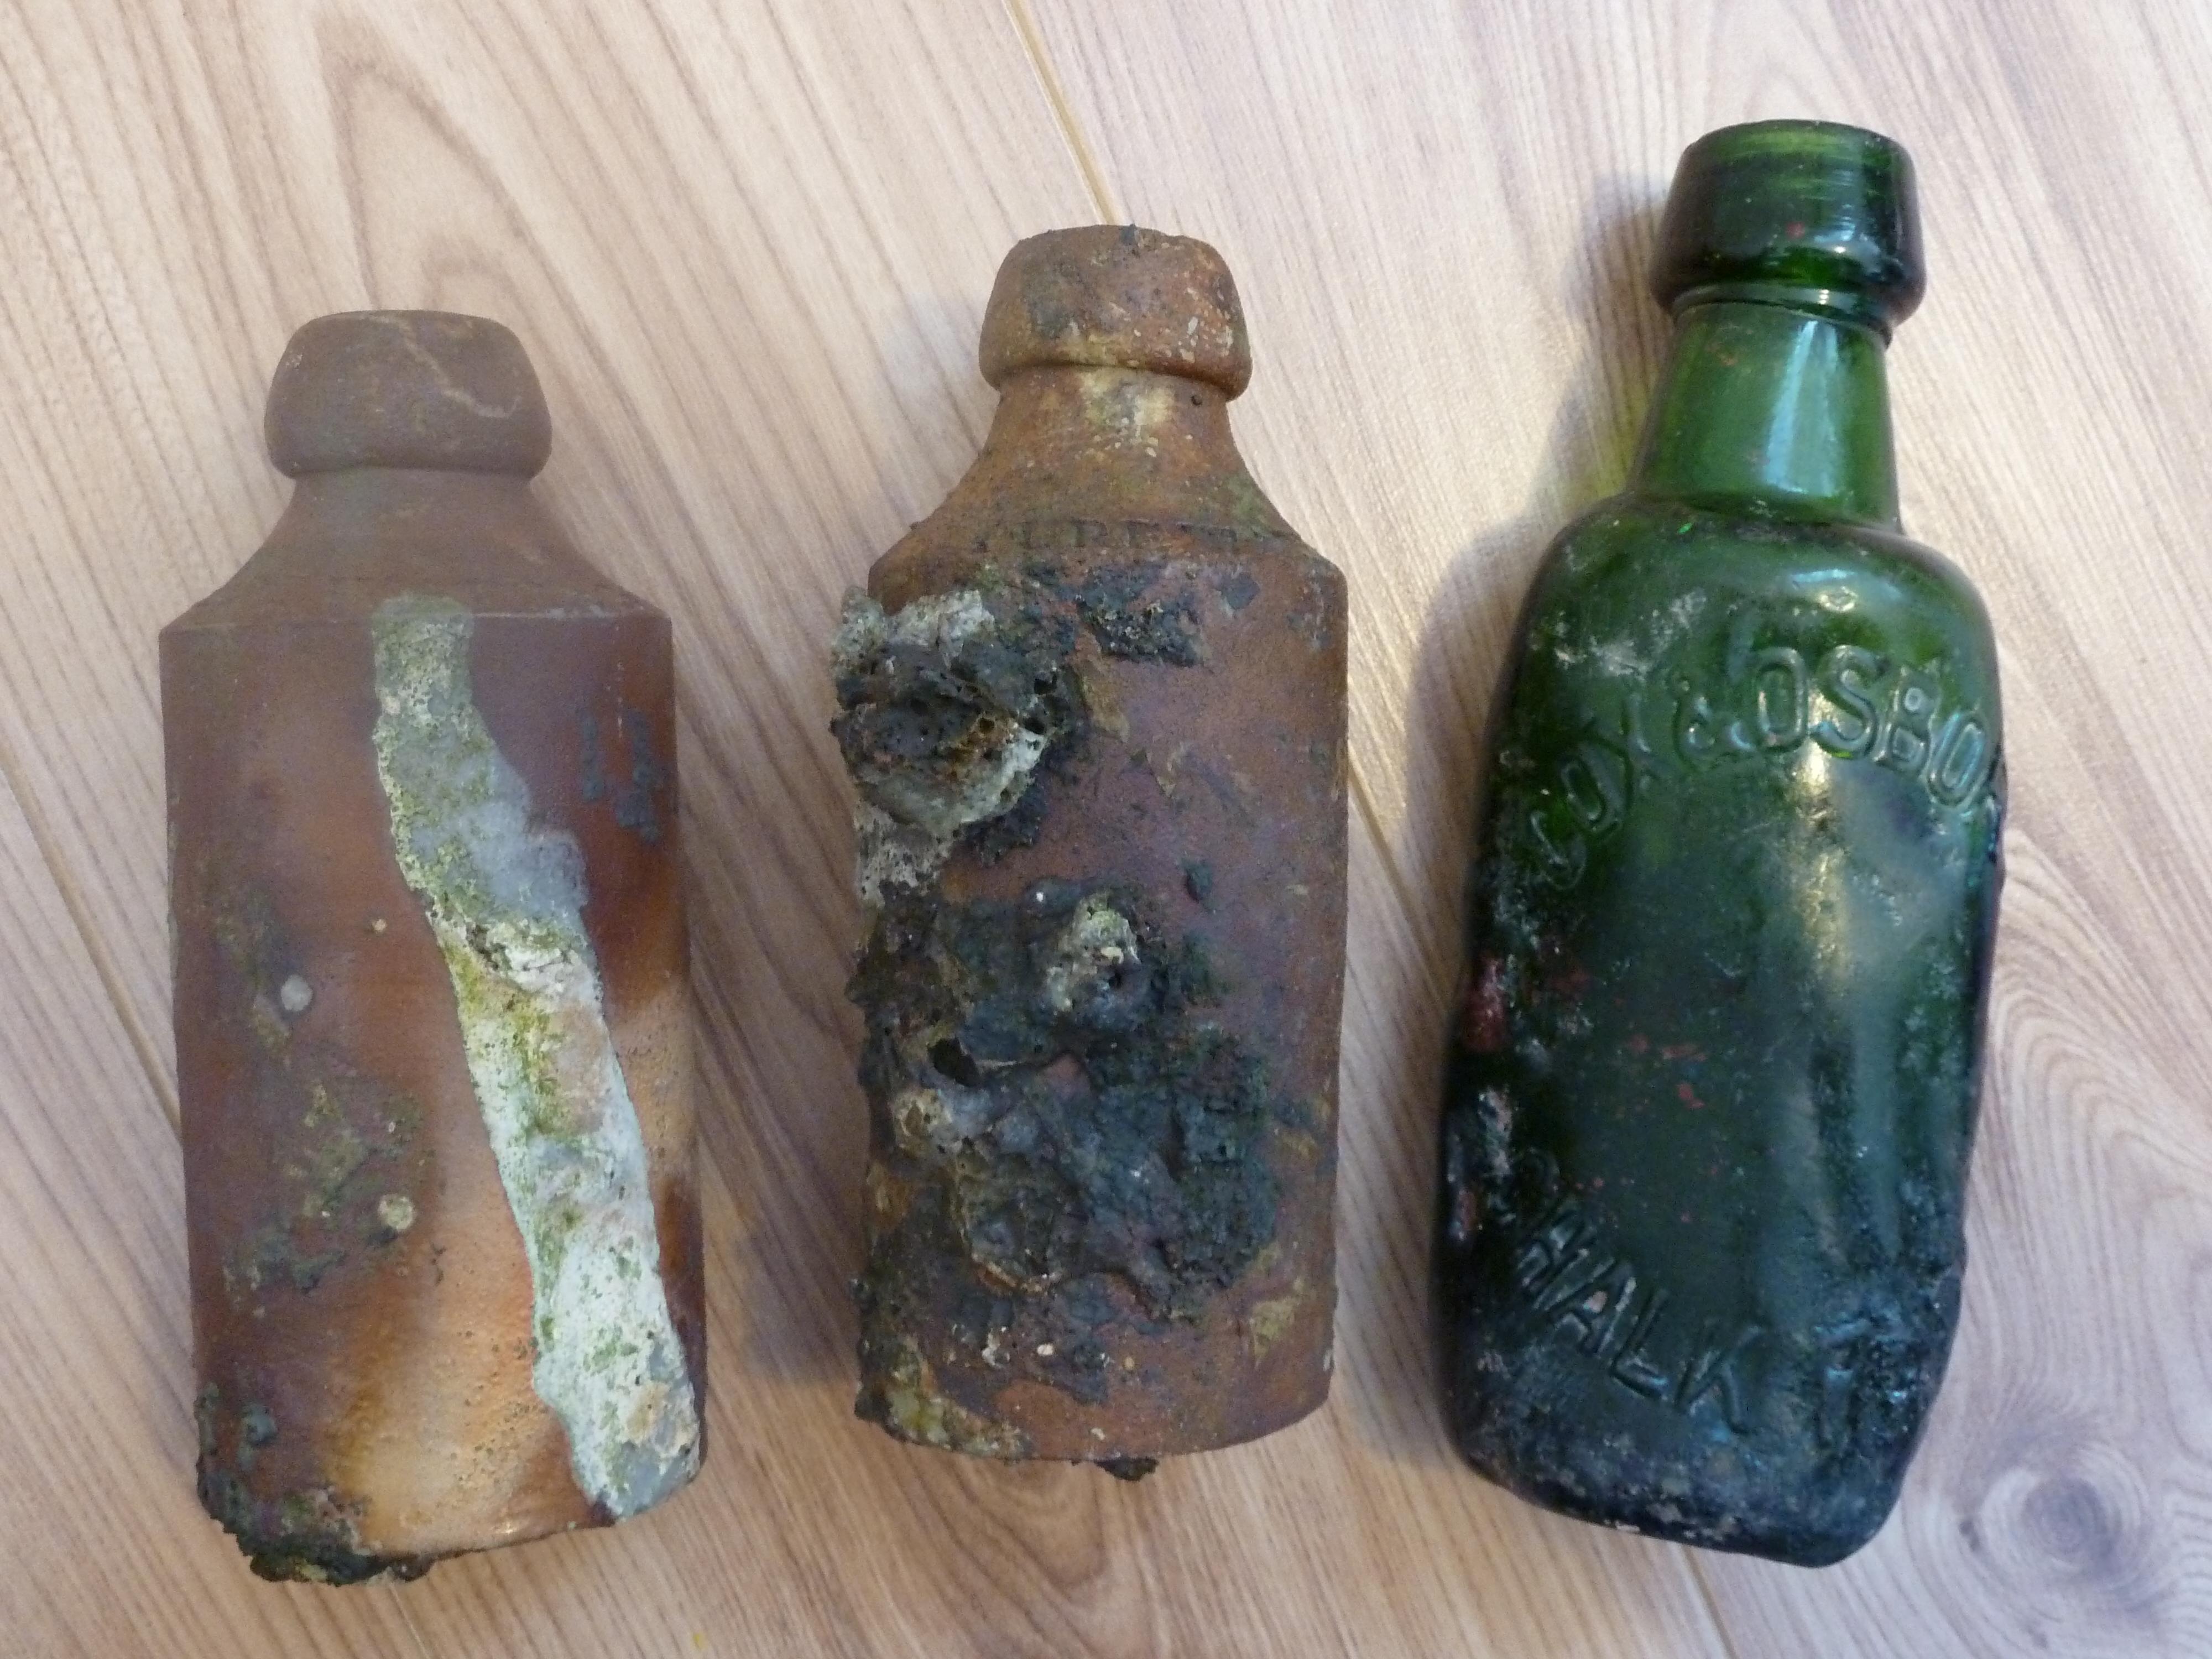 Bottles from a Destructor